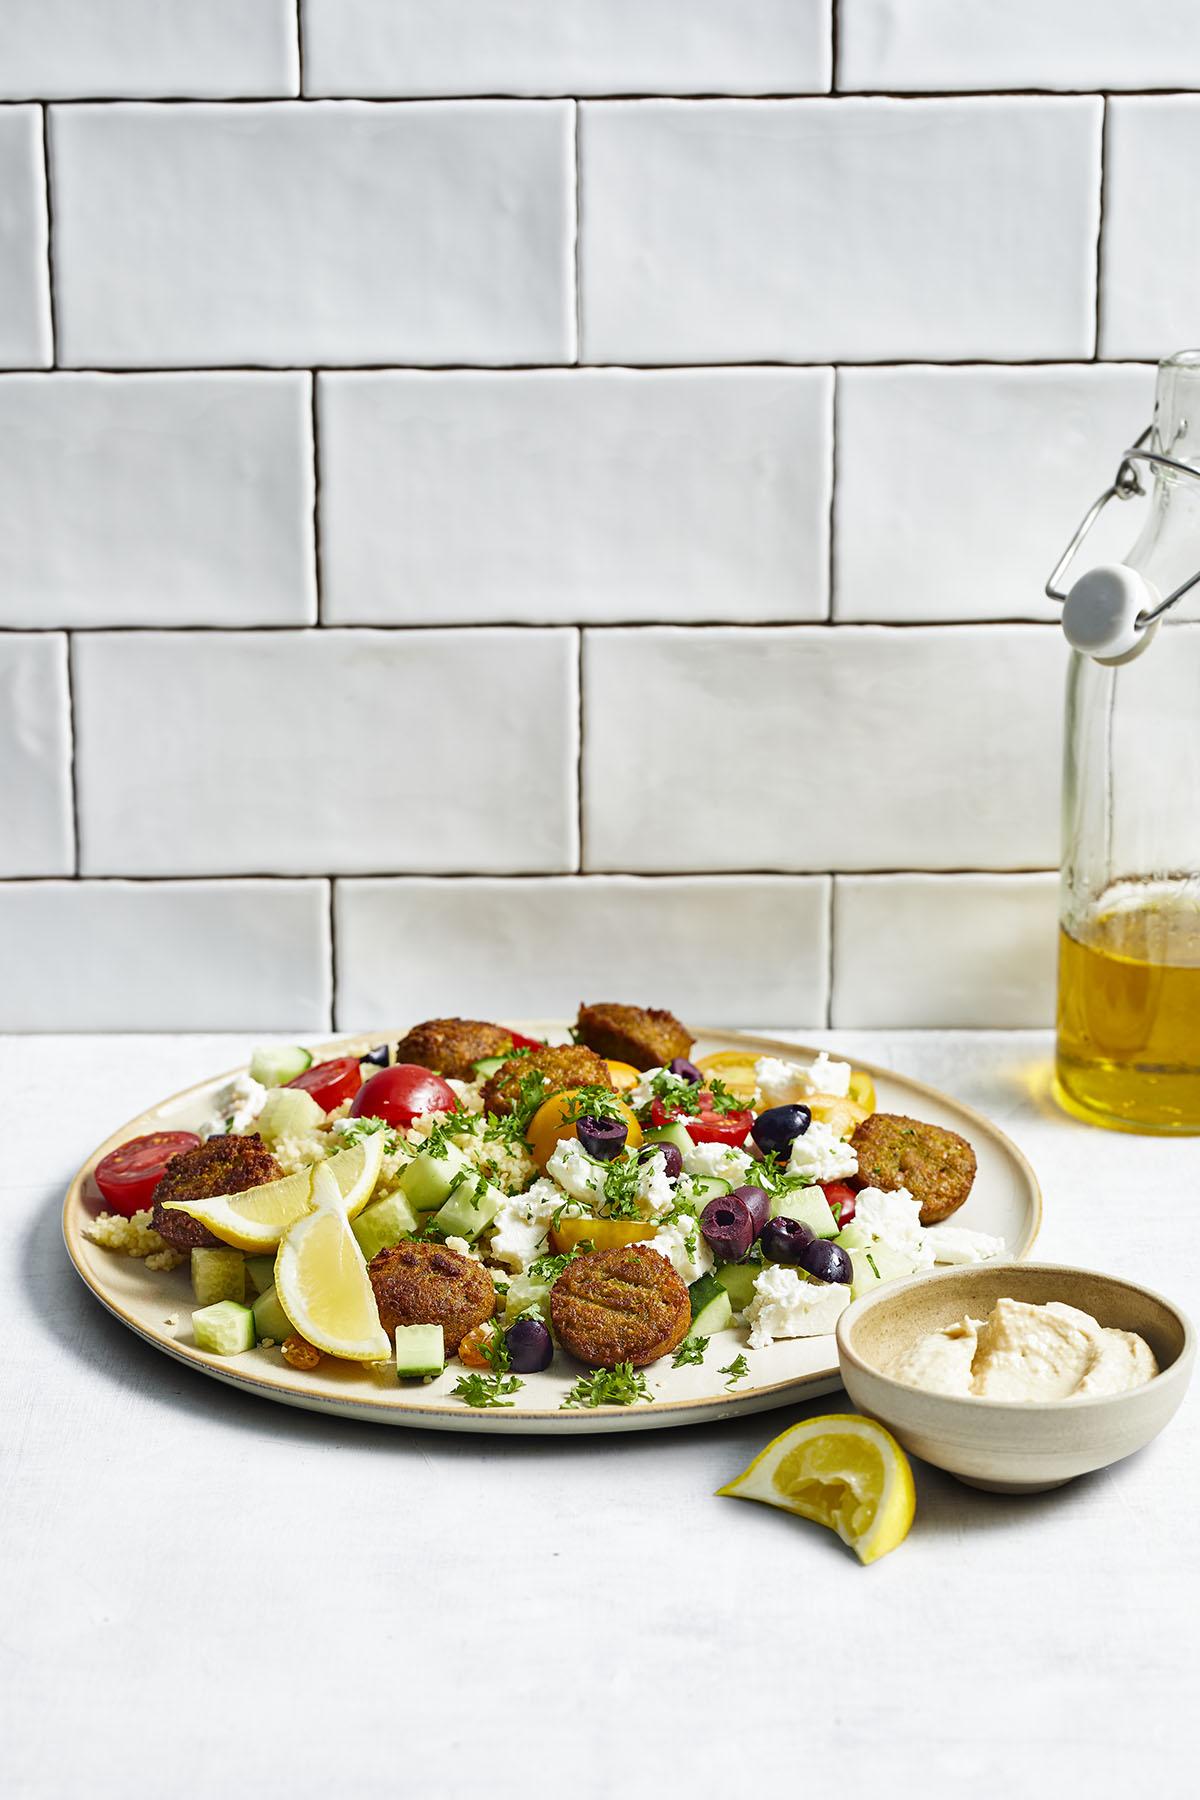 Couscoussalade met falafel